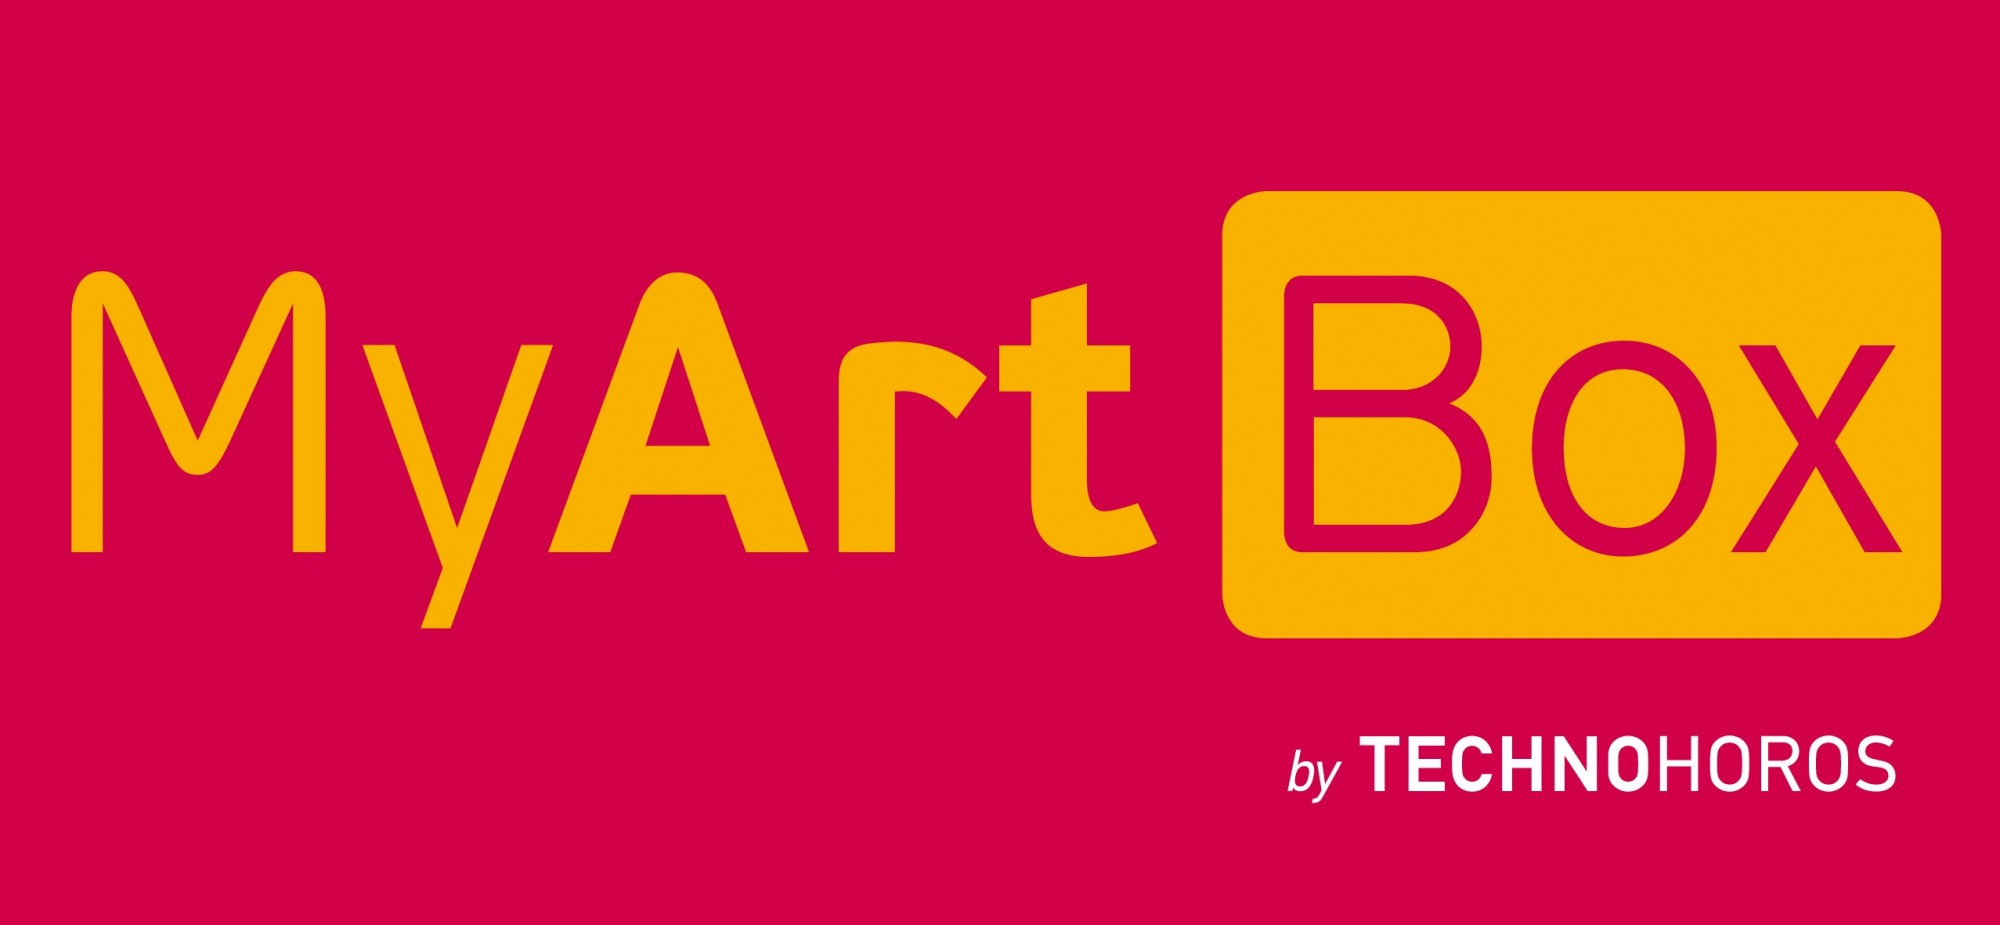 myartbox-logo_F